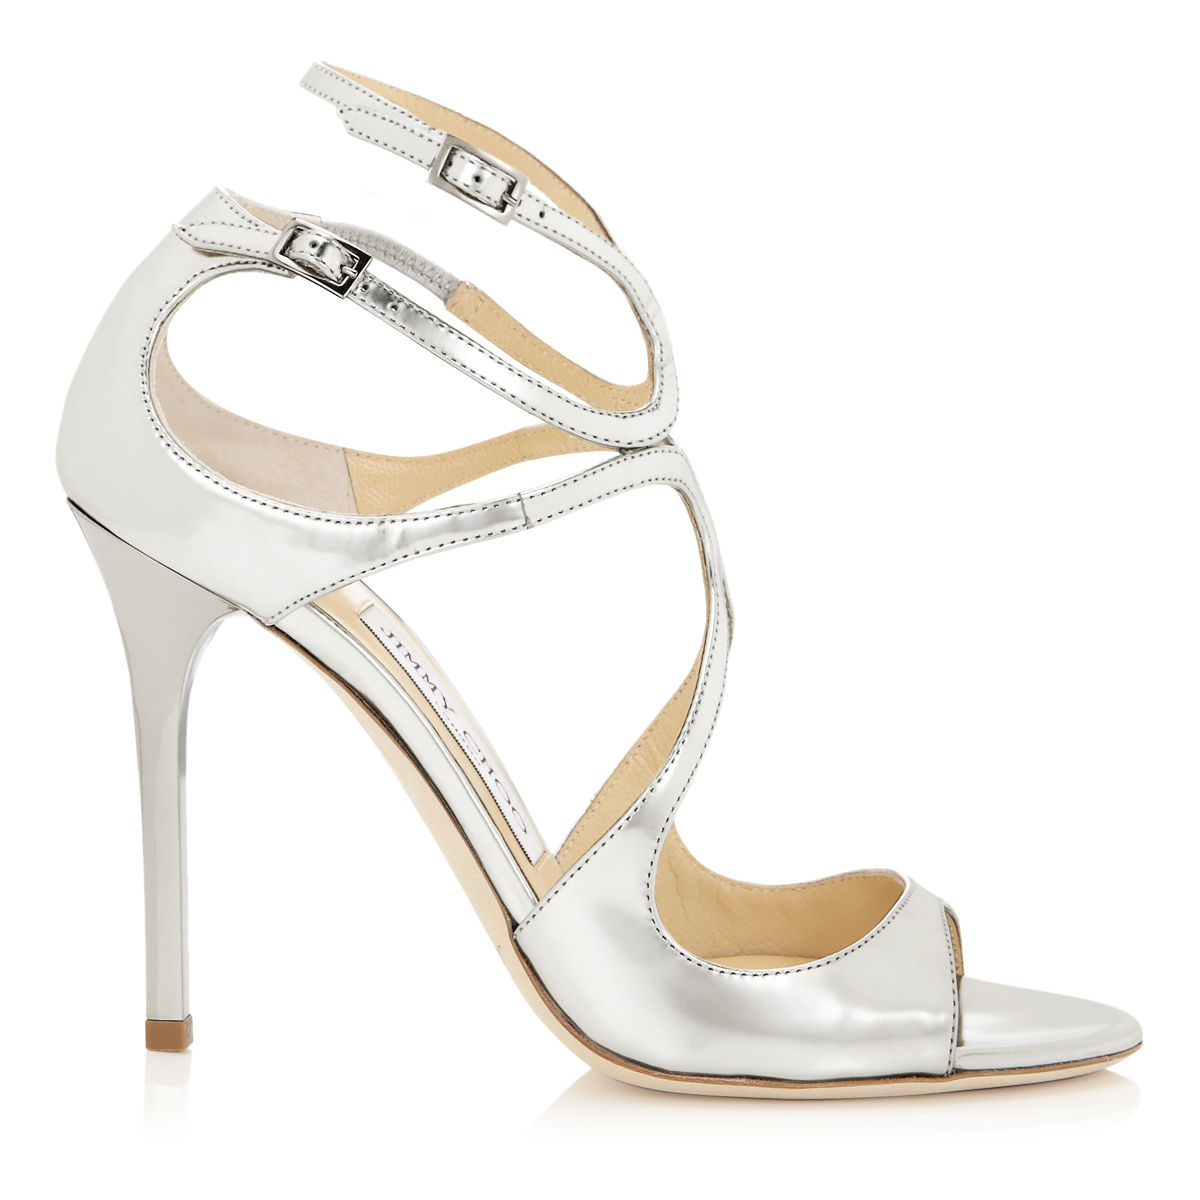 jimmy choo bridal shoes photo - 1